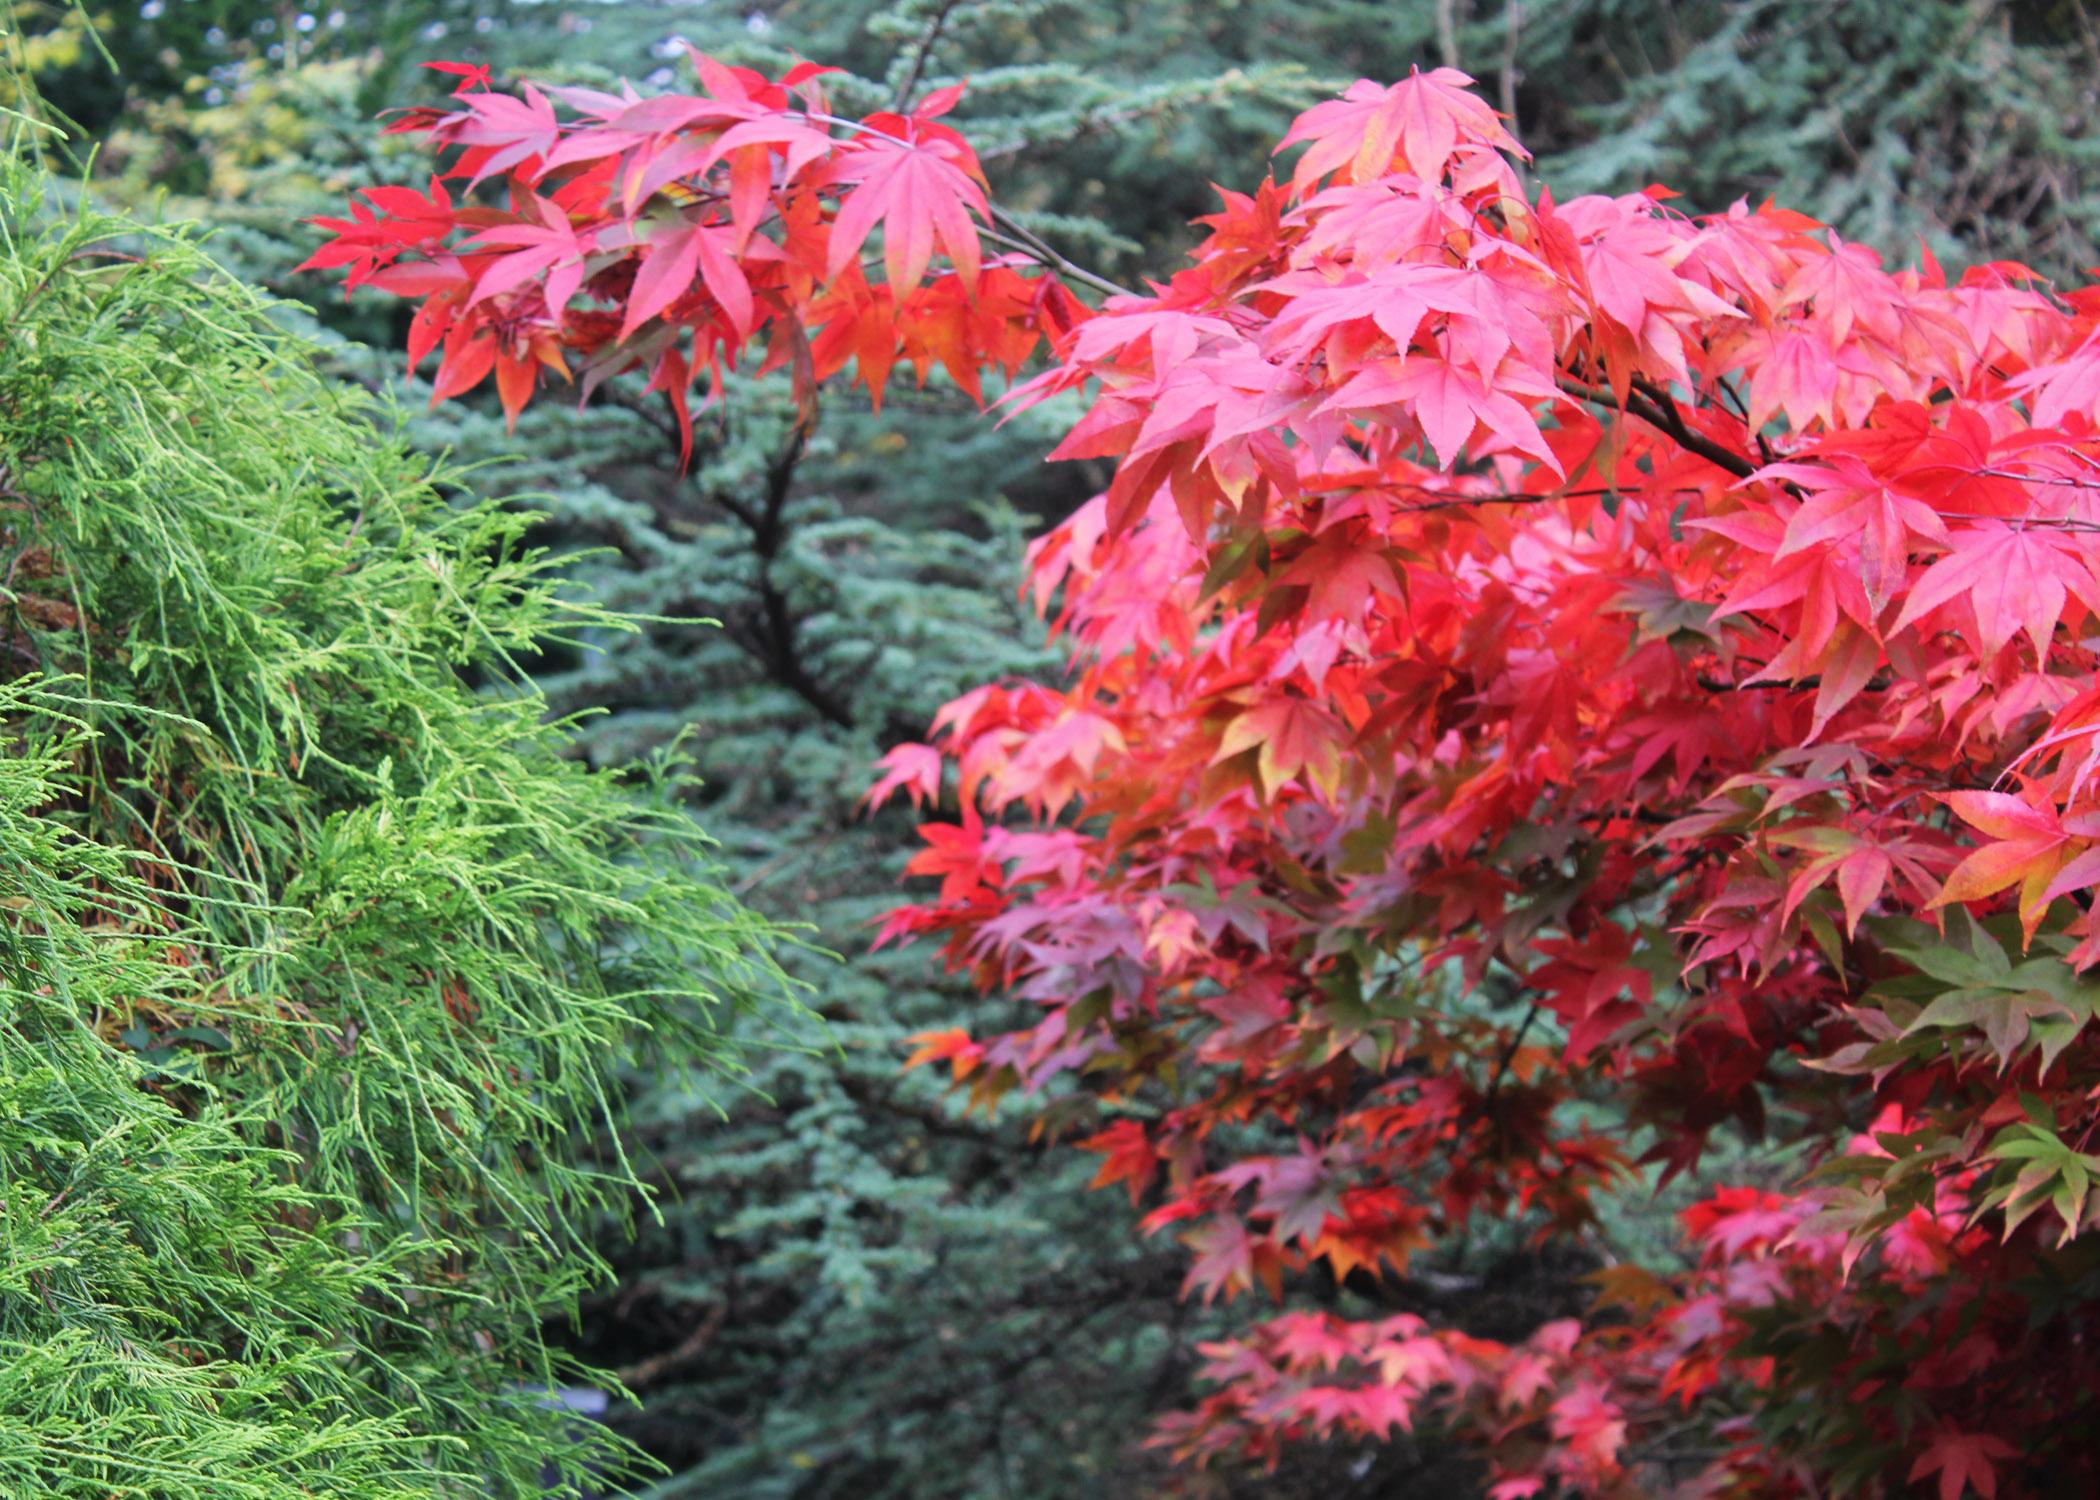 Foliage in the Plantation